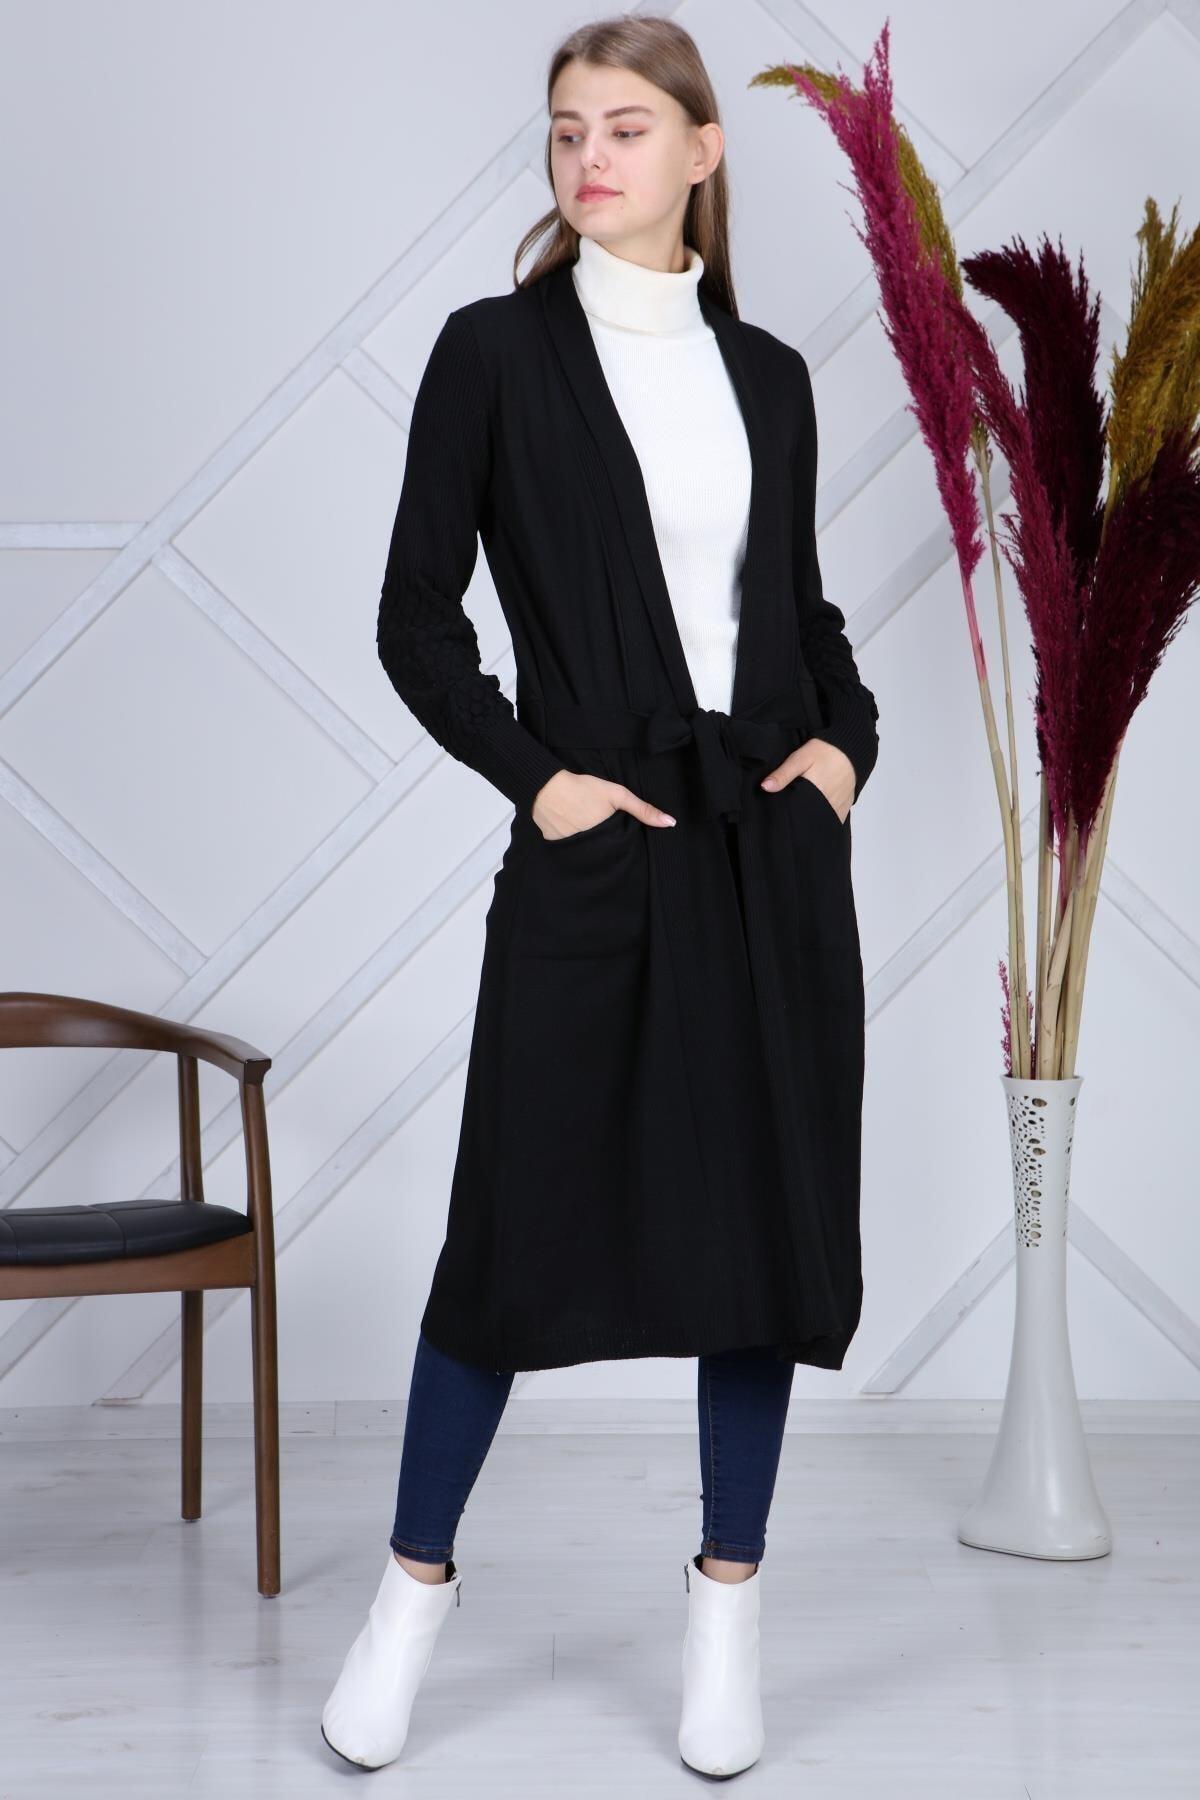 şeymaebrar Kadın Siyah Kol Detaylı Triko Uzun Hırka 1